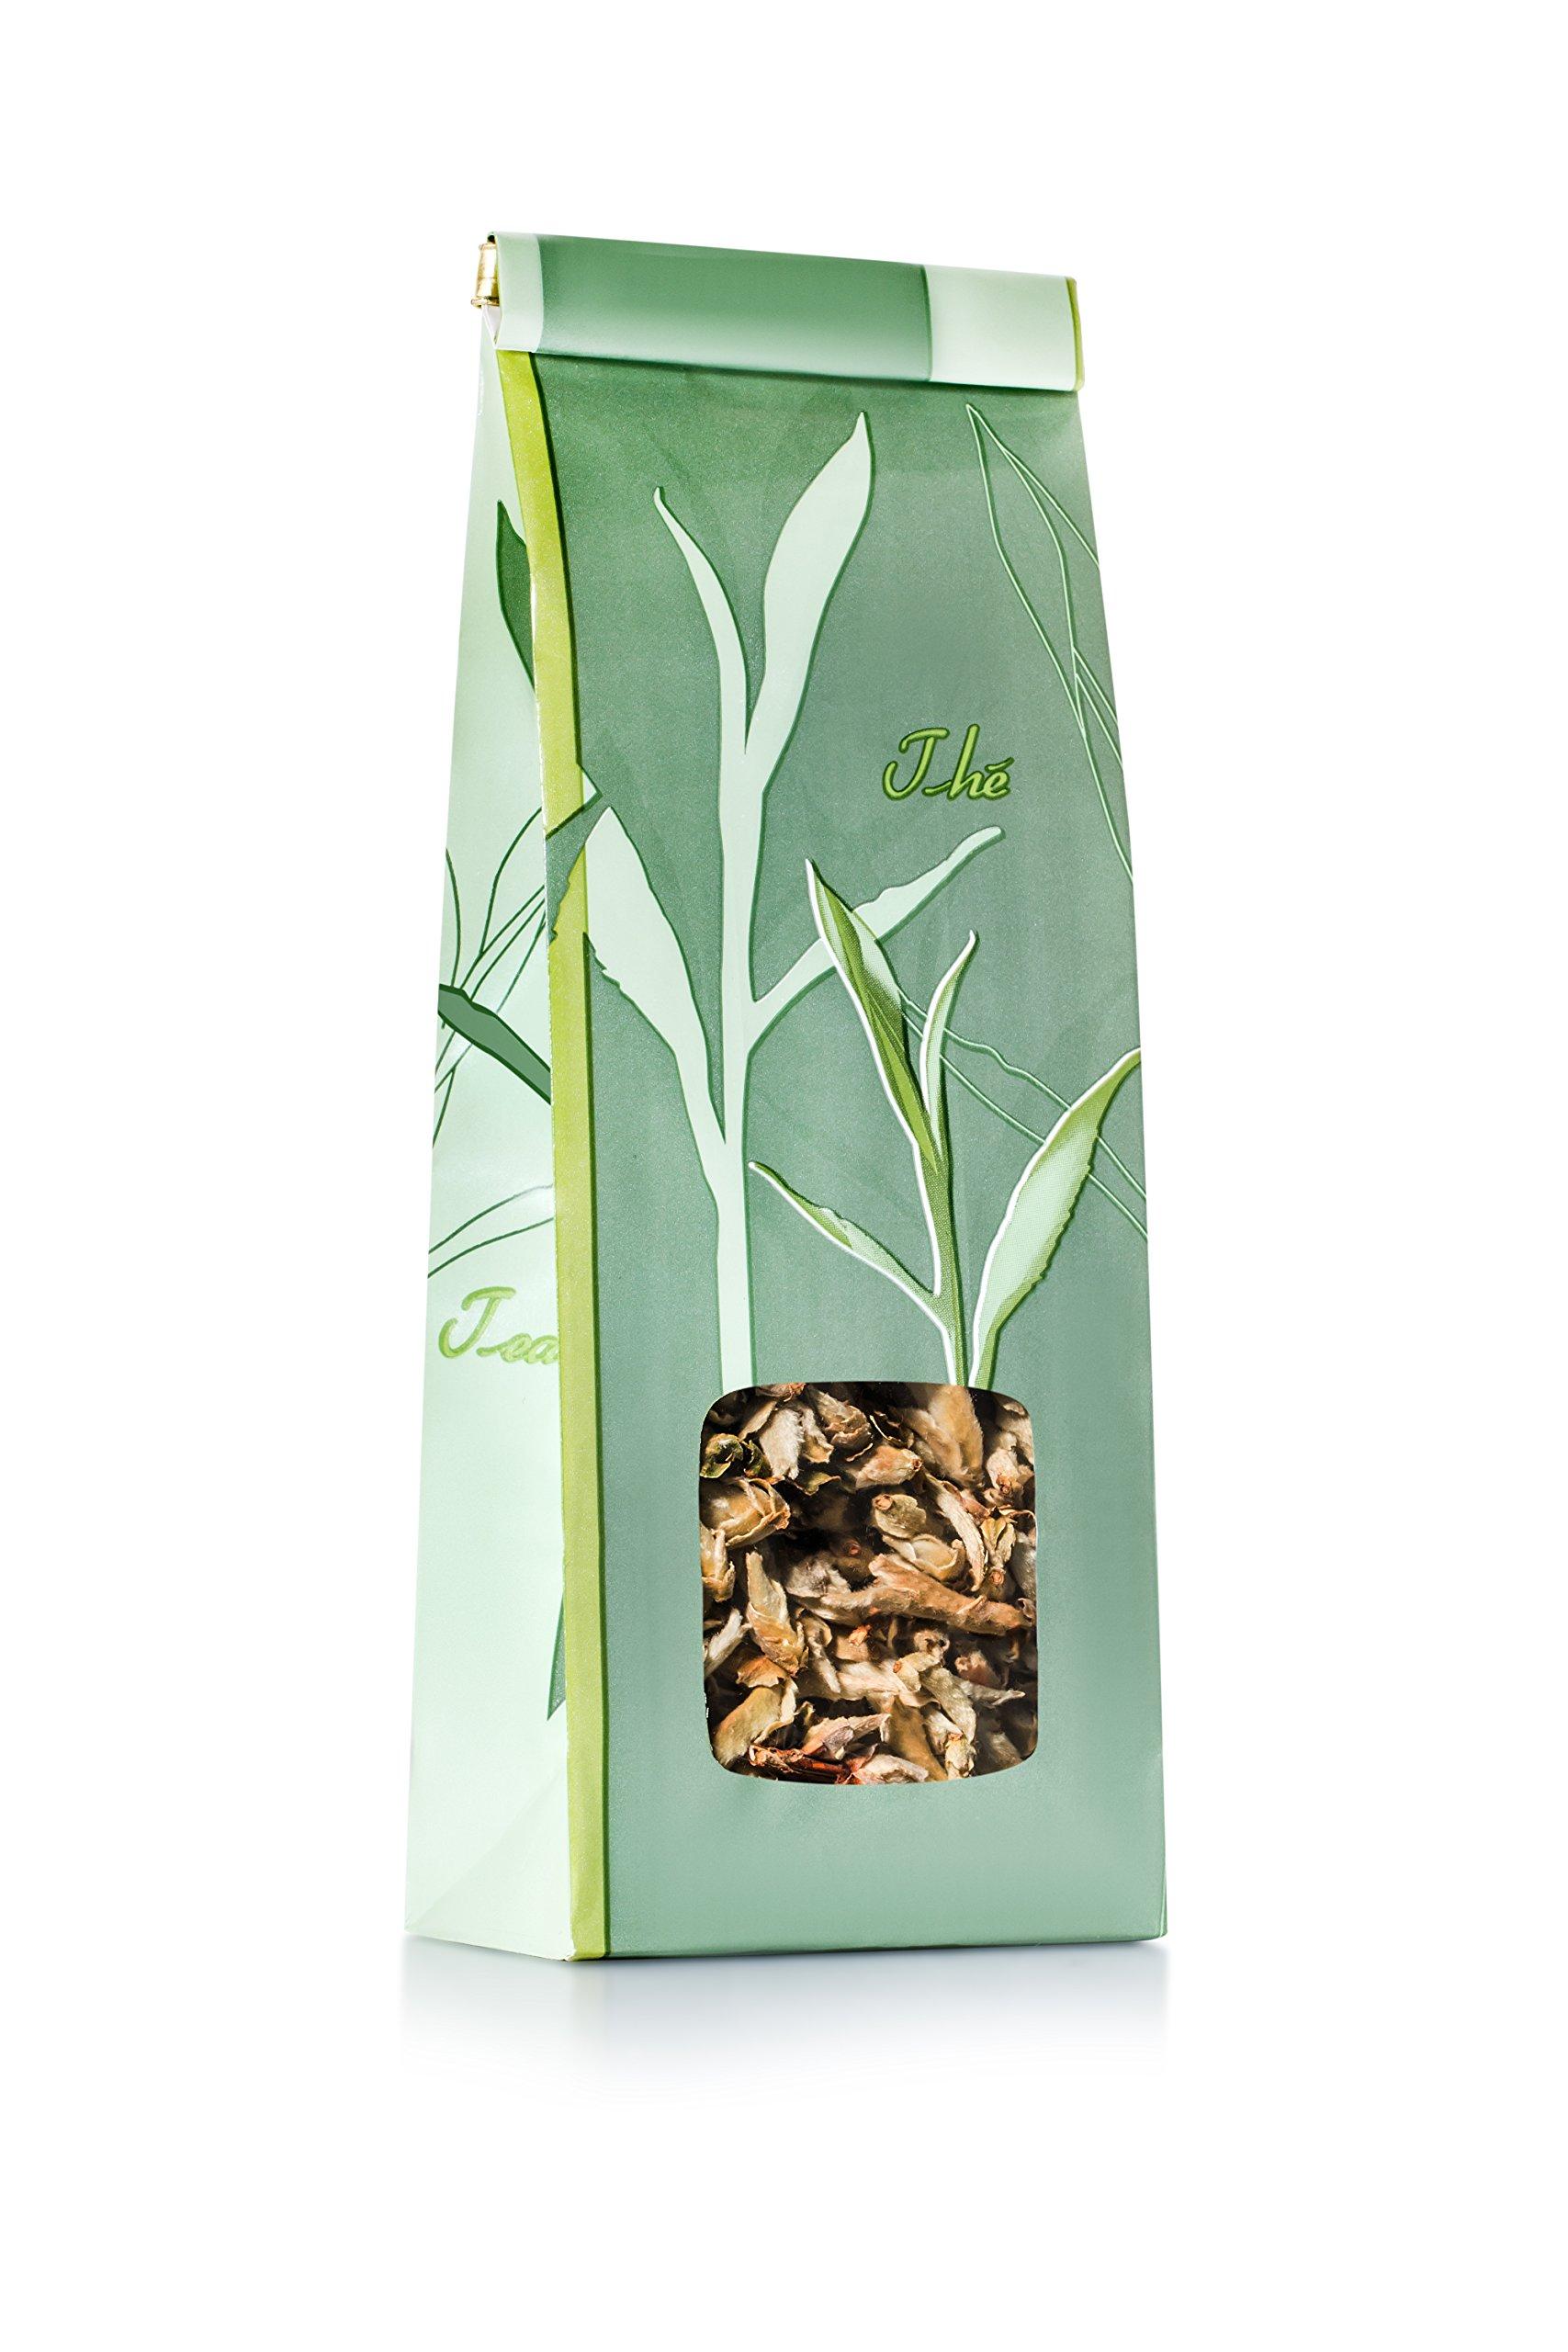 White-Tea-Loose-Tea-special-quality-100200300400500-600-grams-From-Abes-Tea